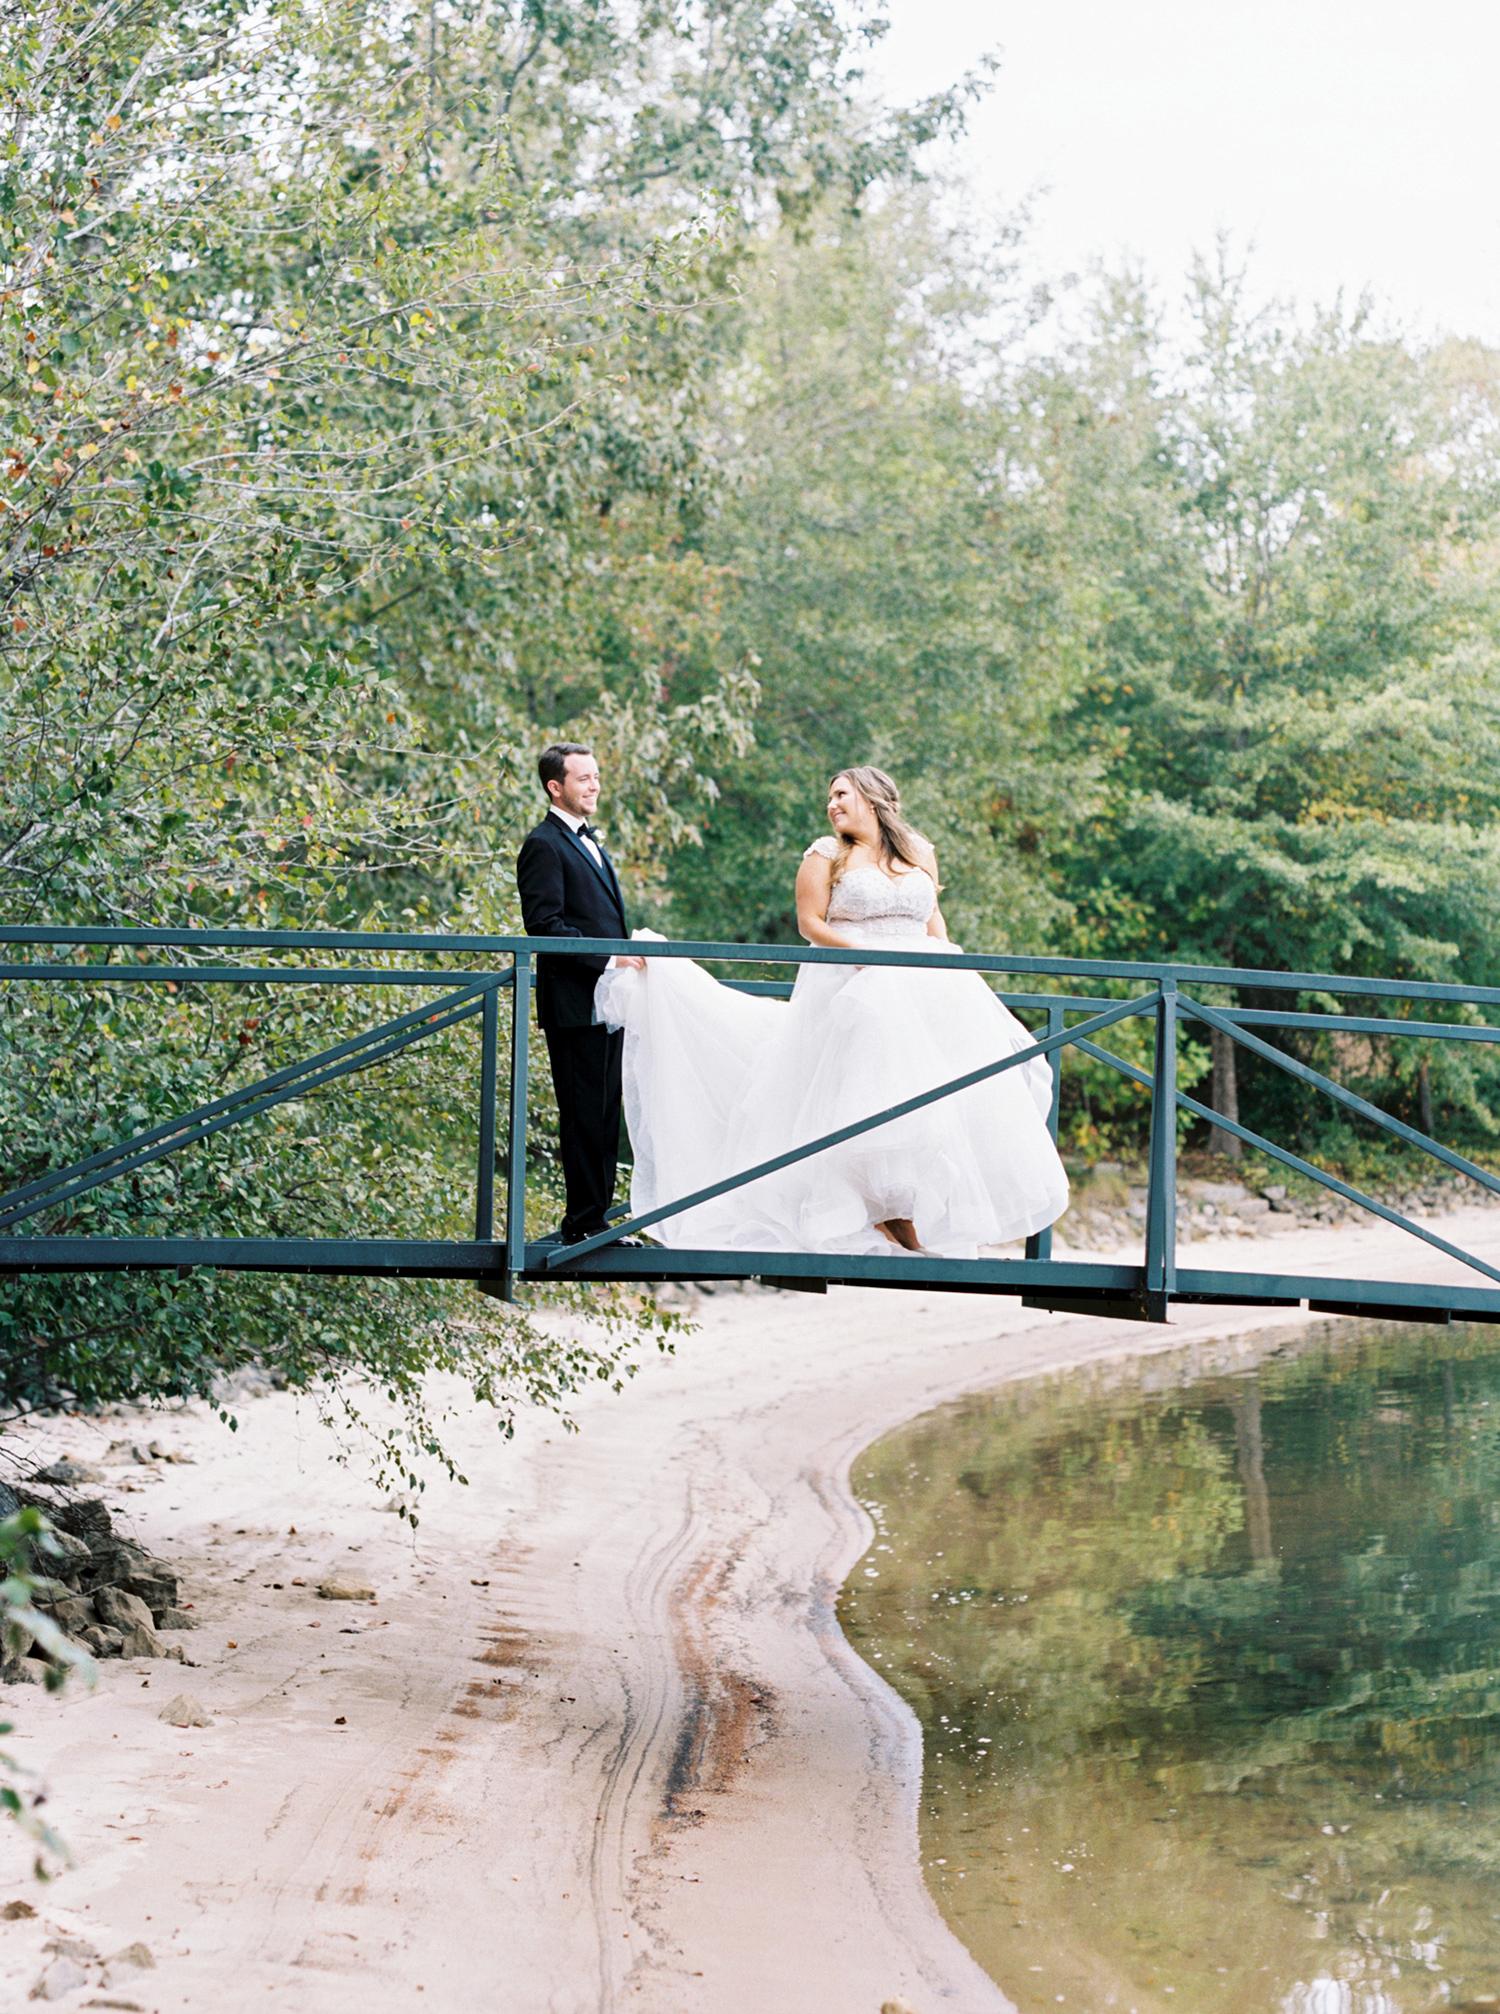 brittany alex wedding couple on bridge